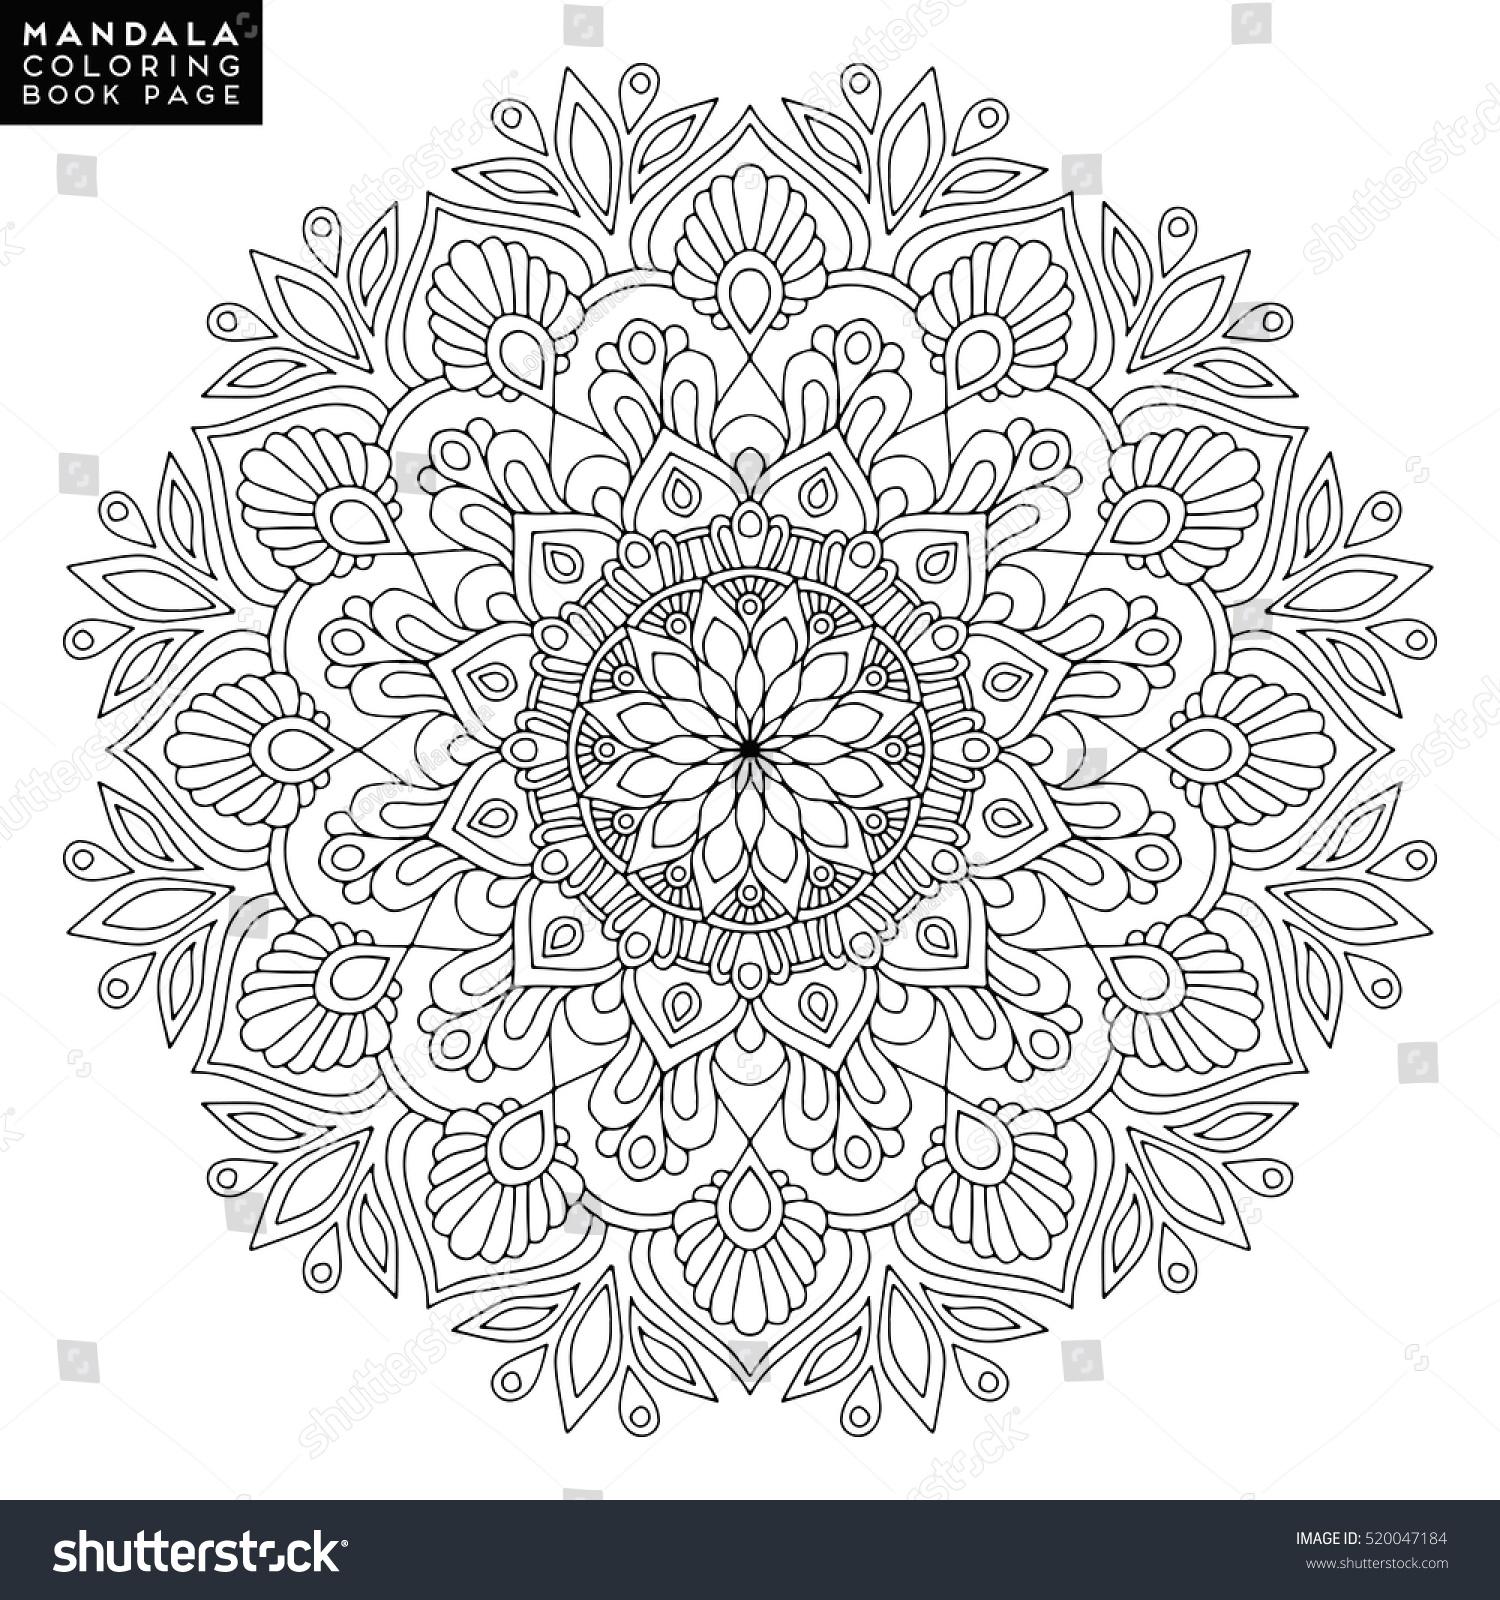 mystical mandala coloring pages - royalty free flower mandala vintage decorative